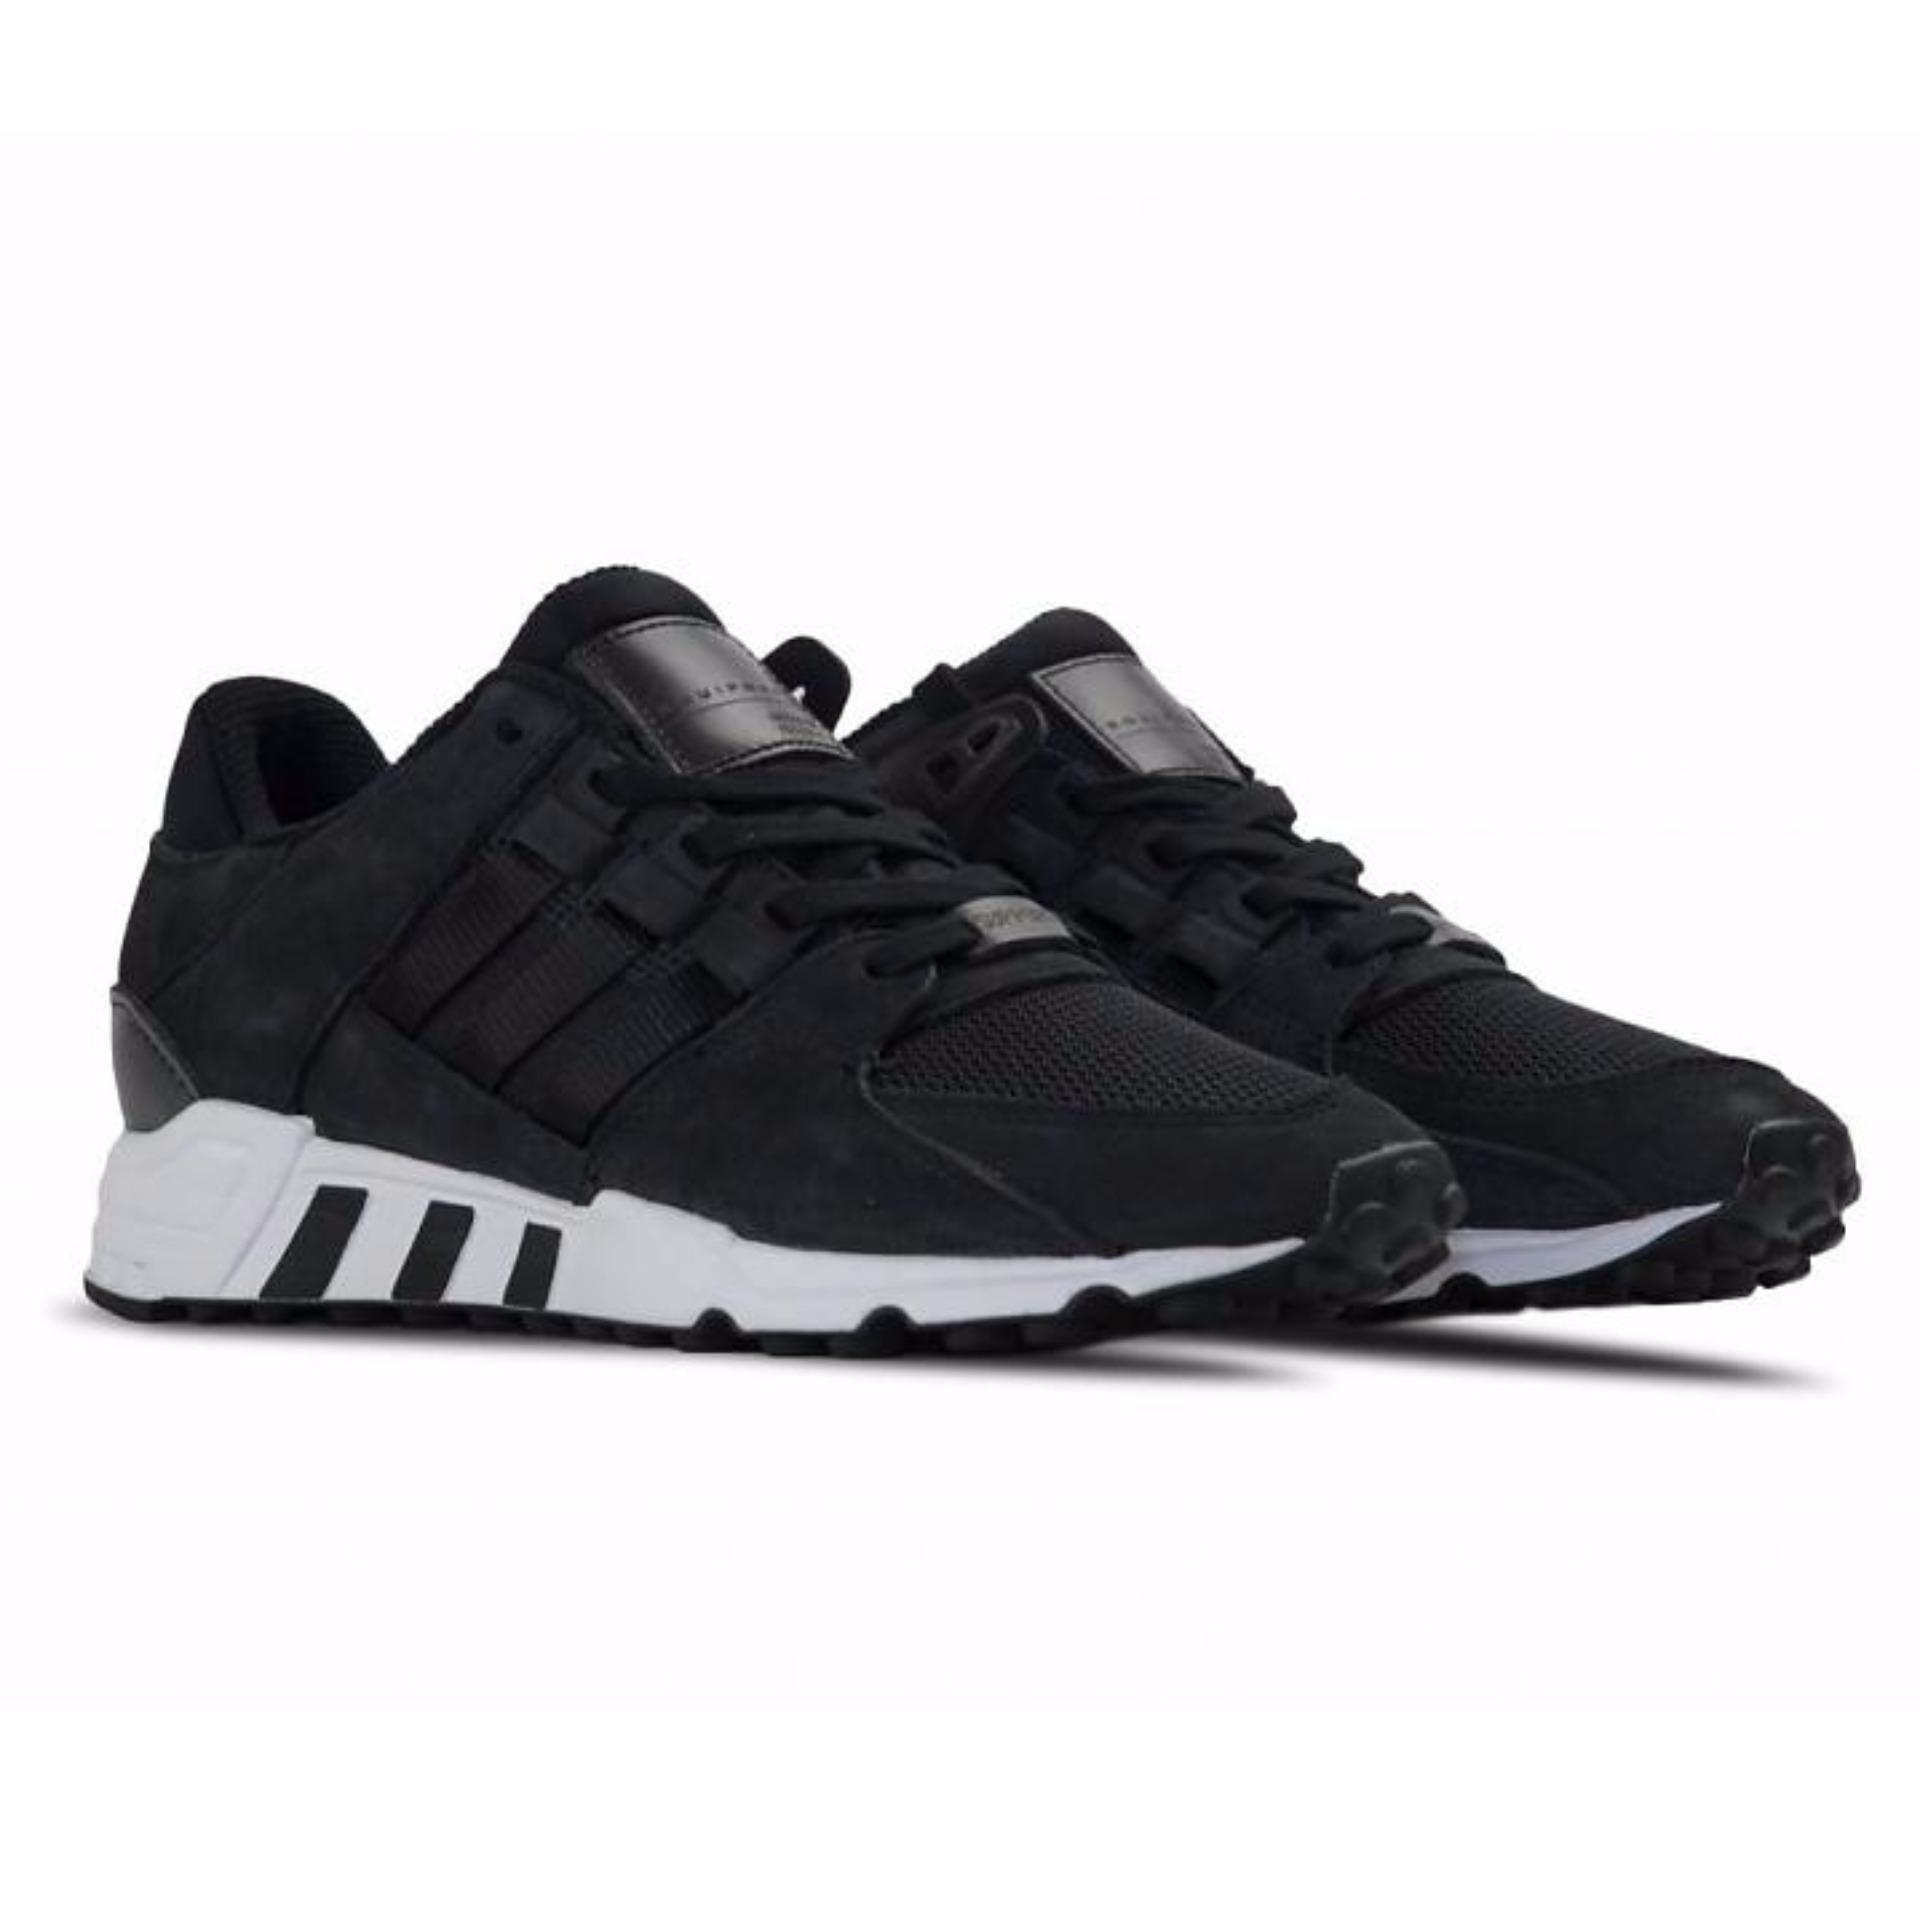 Toko Adidas Sepatu Sneaker Eqt Support Rf Bb1312 Hitam Termurah